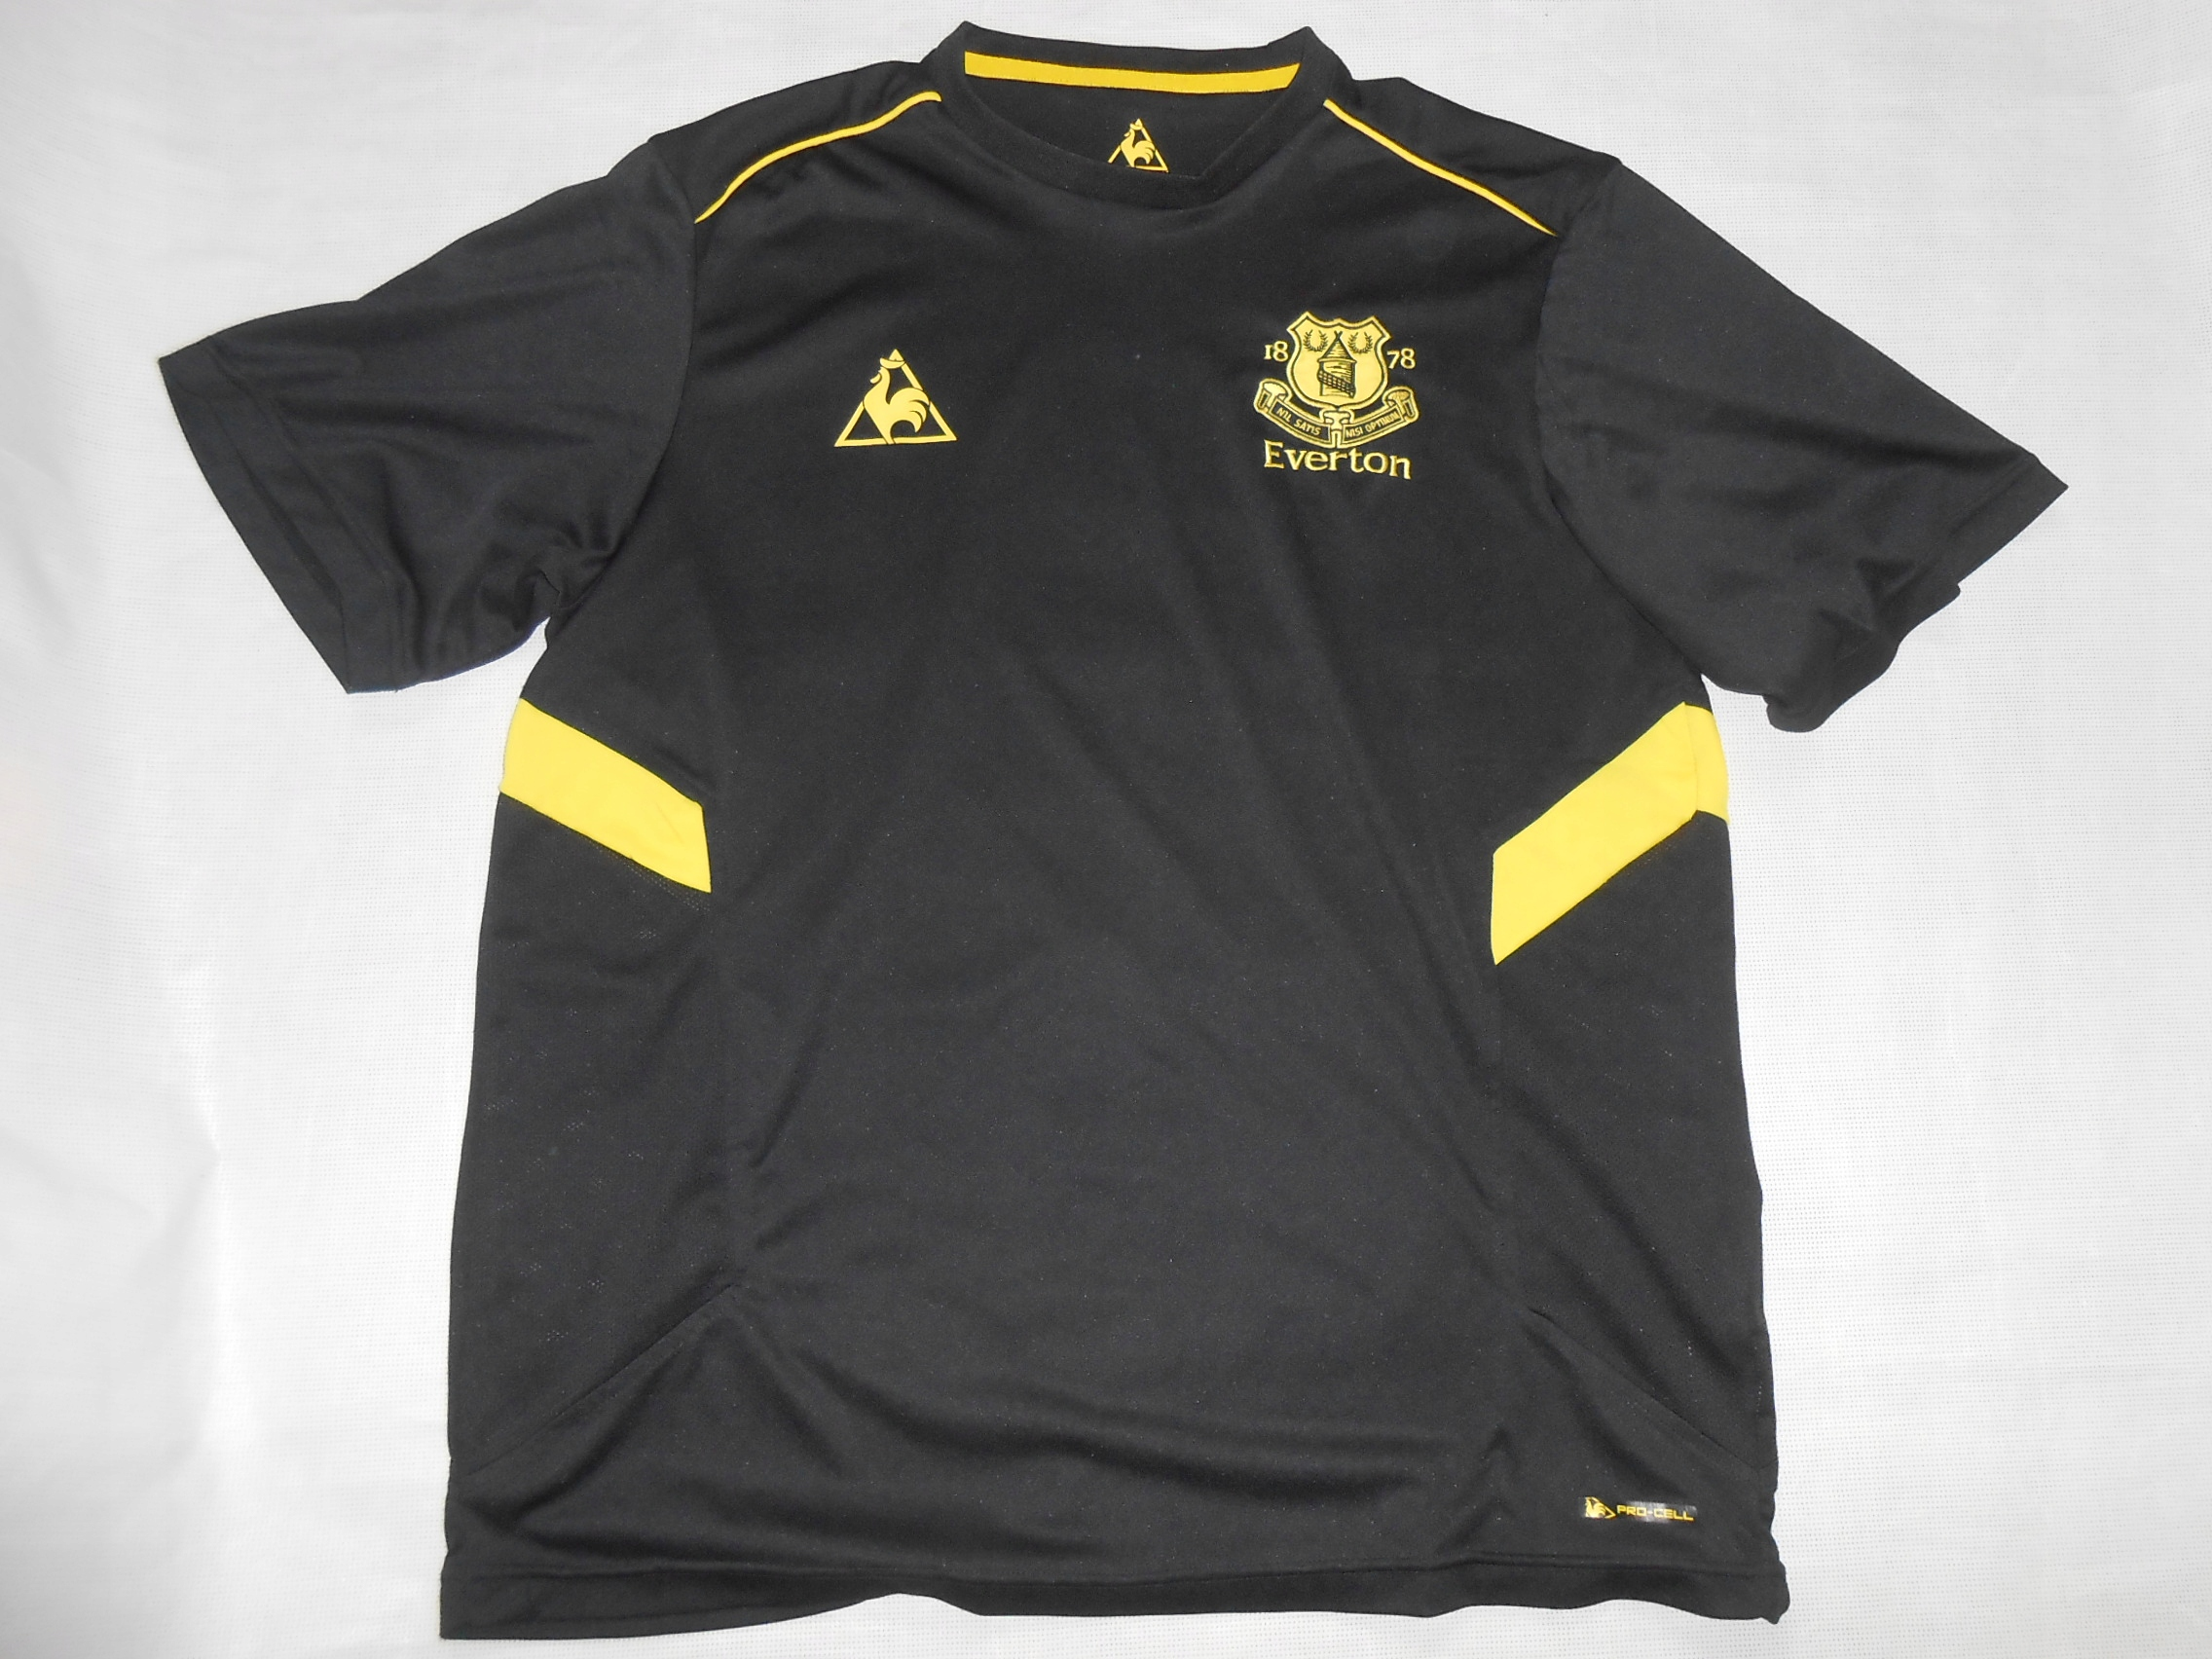 LA COP SPORTIF koszulka EVERTON rozm XL